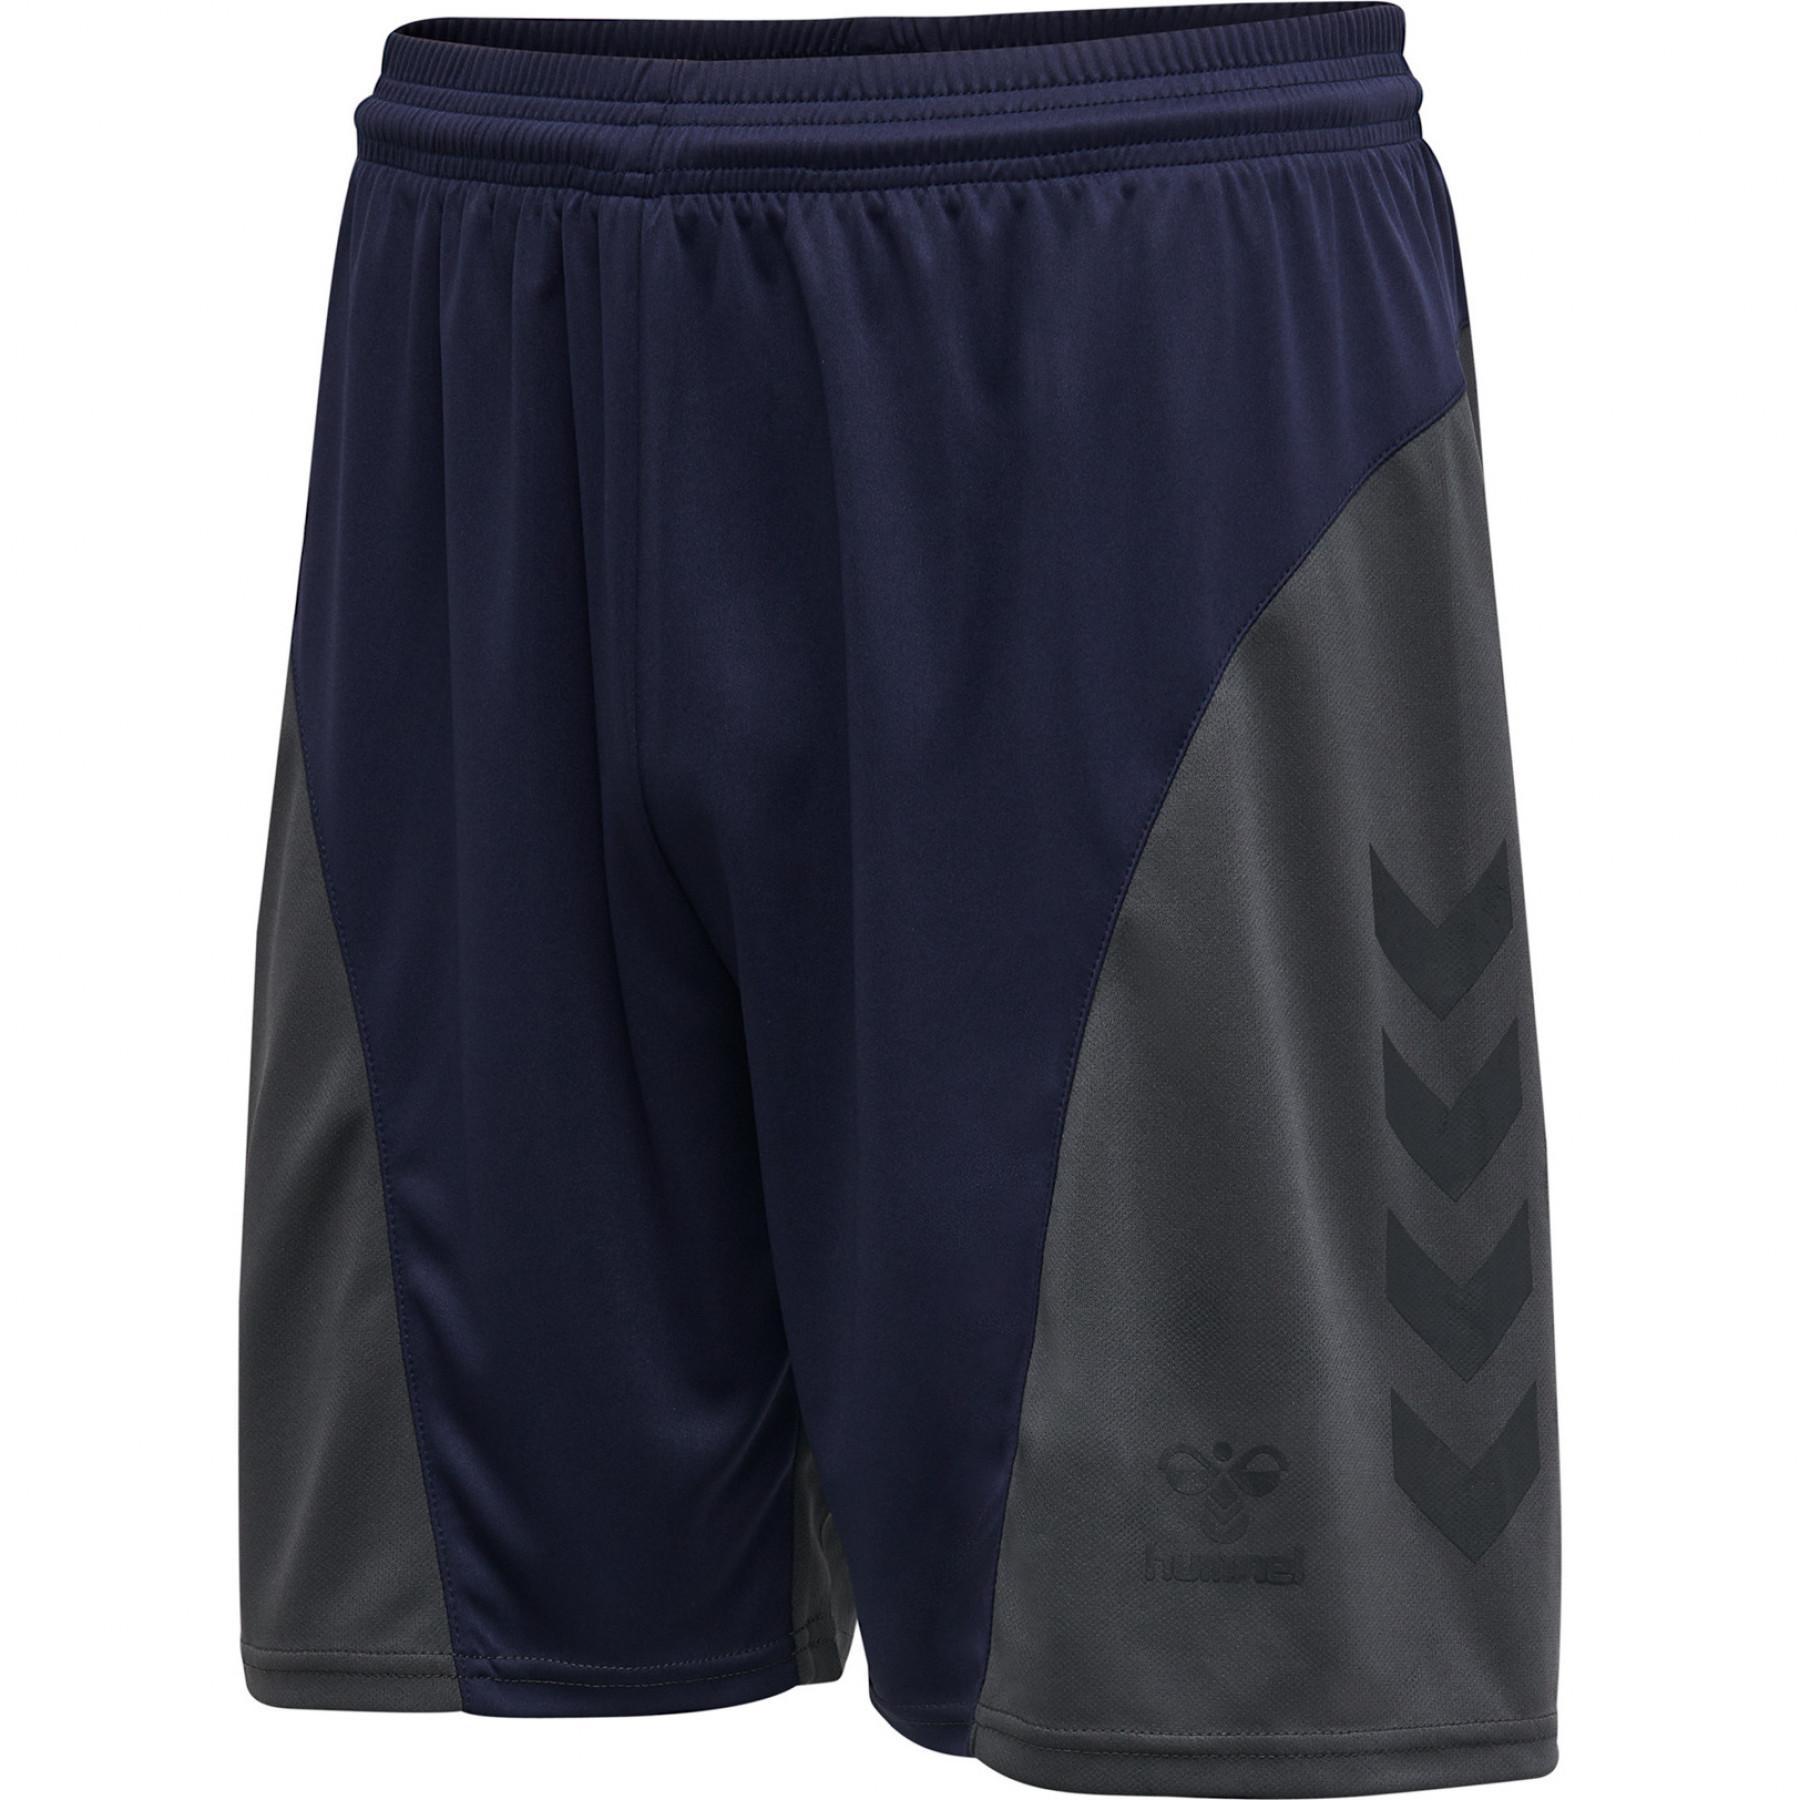 Shorts Hummel hmlACTION